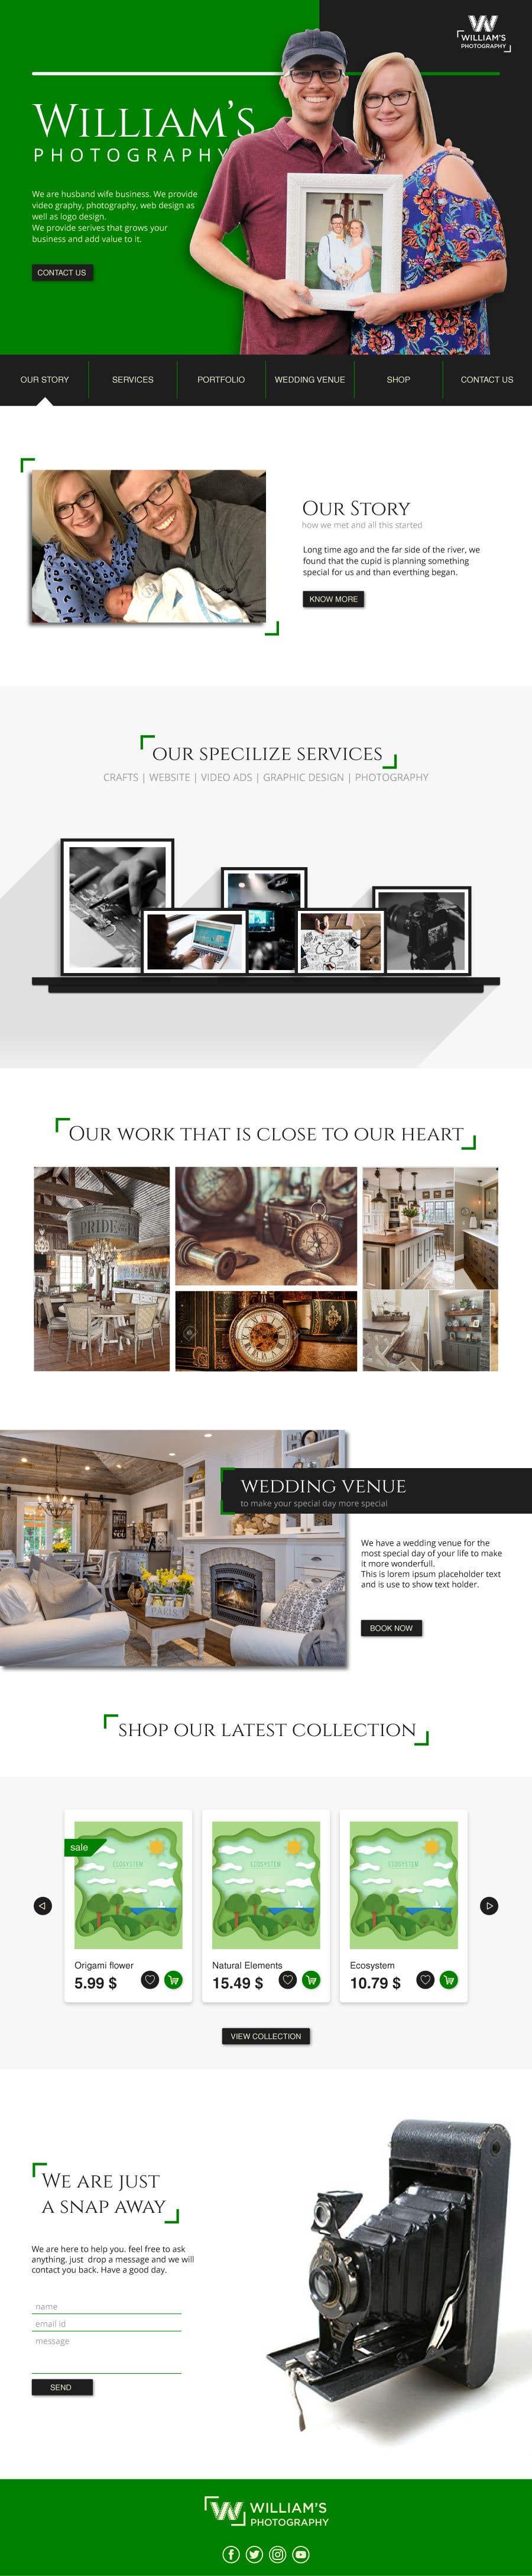 Kilpailutyö #57 kilpailussa Design Clean, Minimalist, Professional Website Layout and Logo